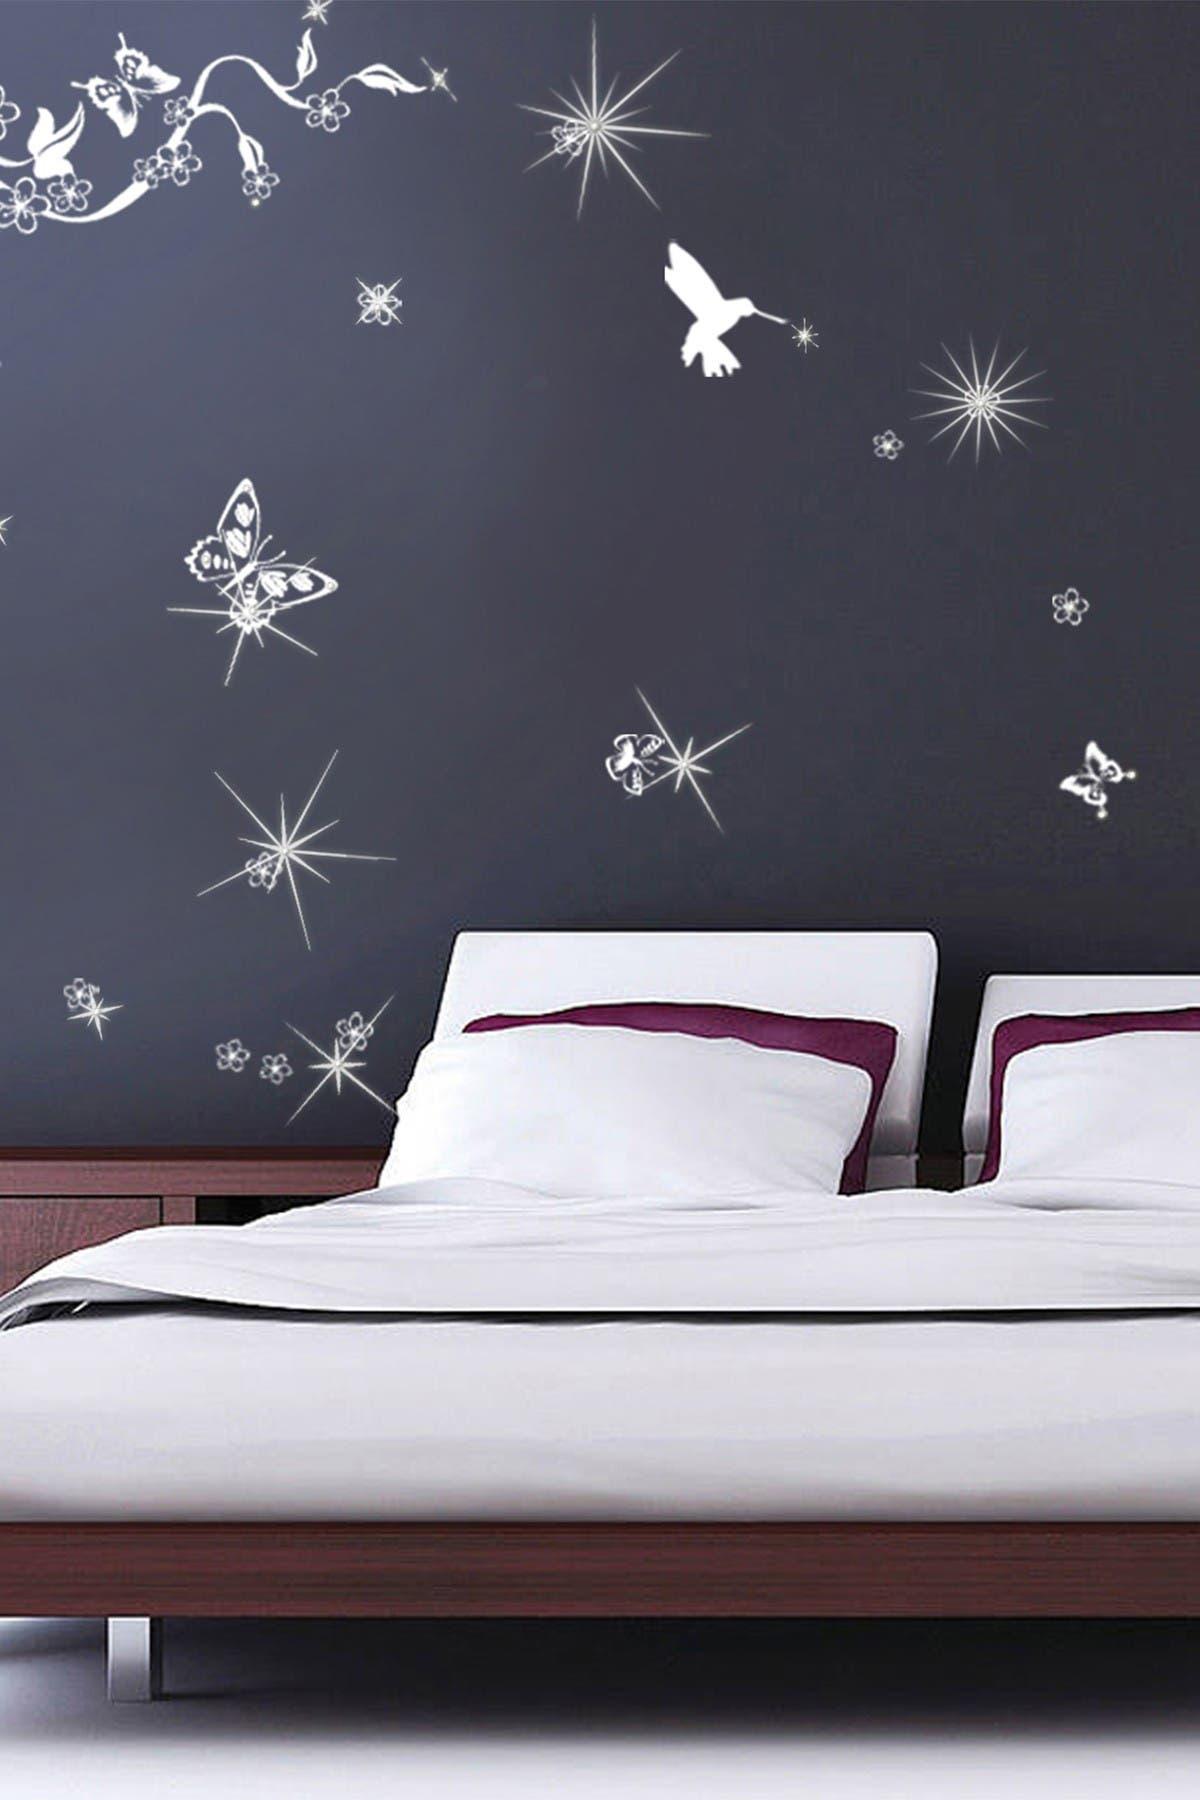 Image of WalPlus Butterflies Vine & Swarovski Crystal Wall Sticker Set